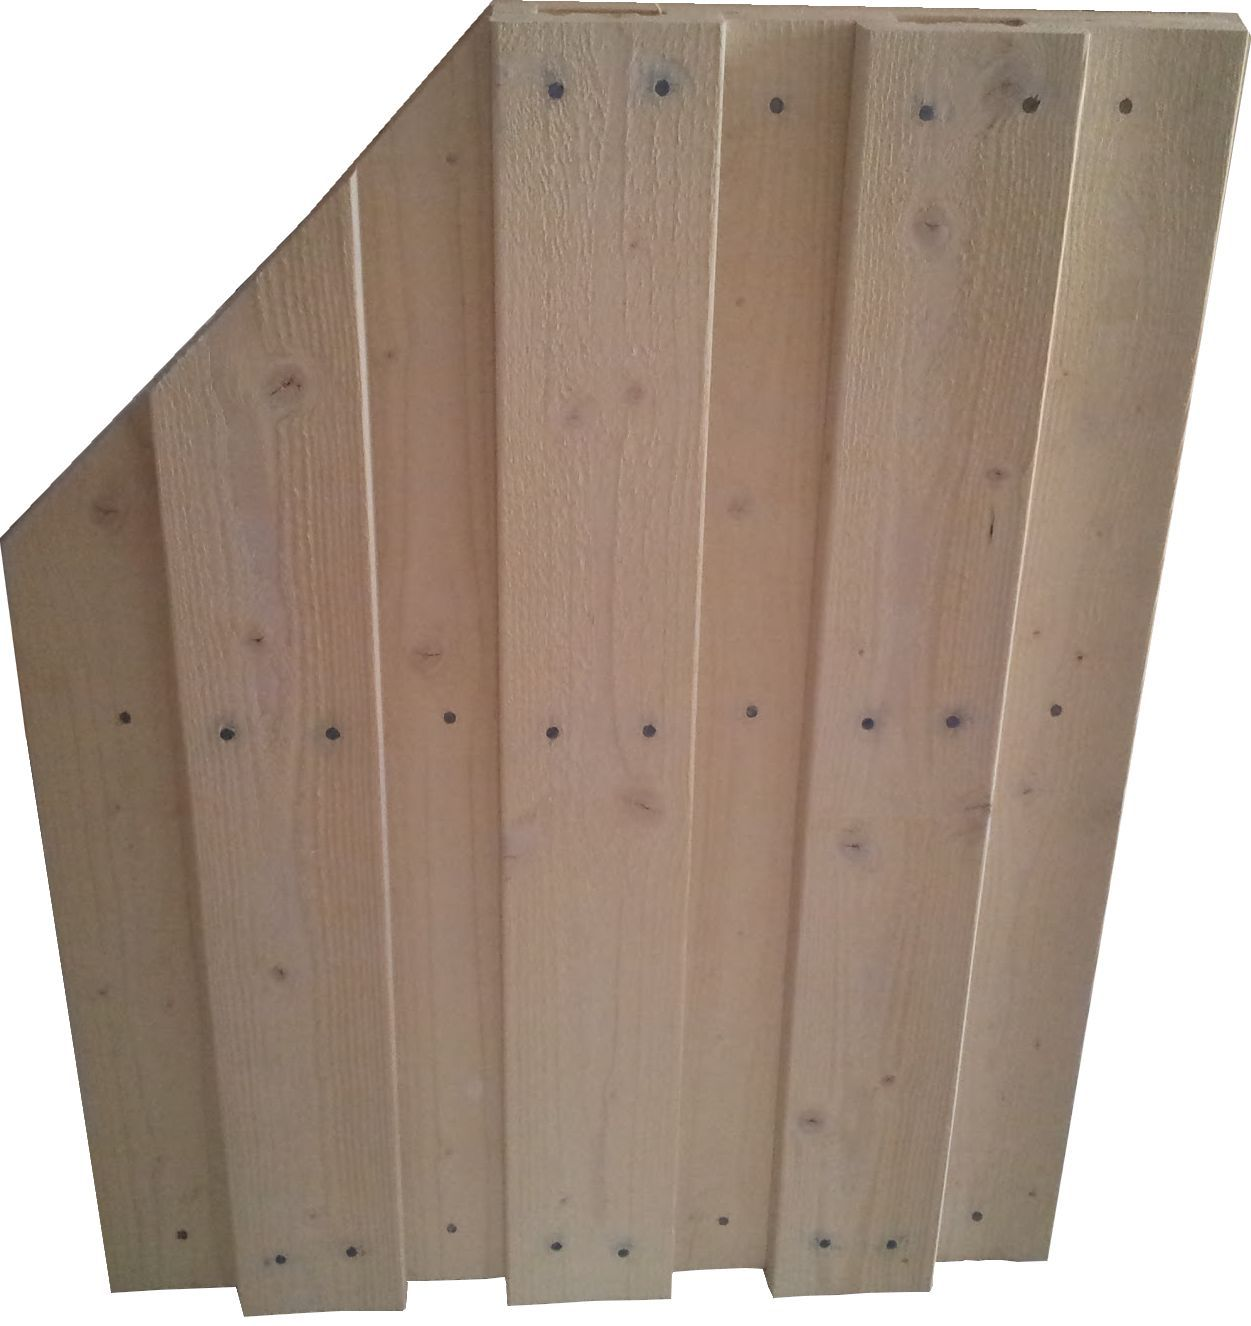 Components Bild 1 Lehner timber home, Bonndorf in the